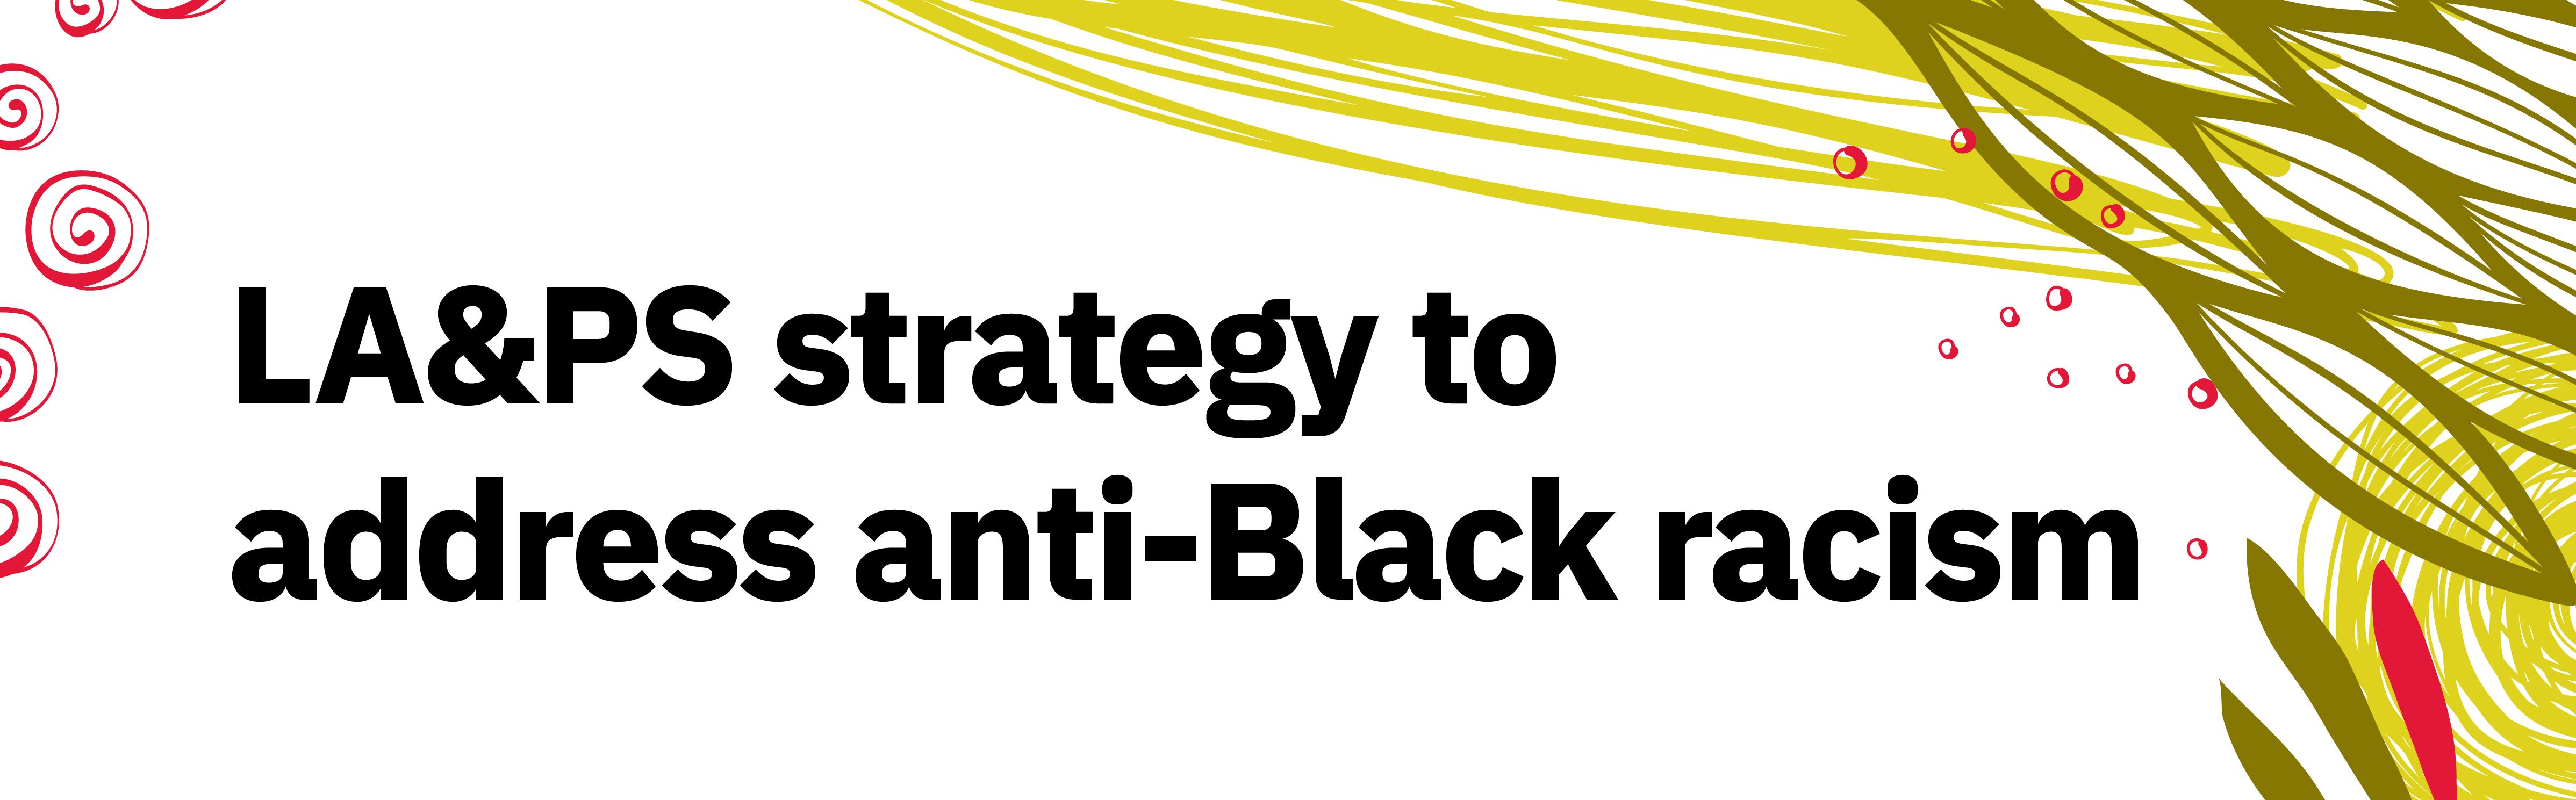 LA&PS strategy to address anti-Black racism